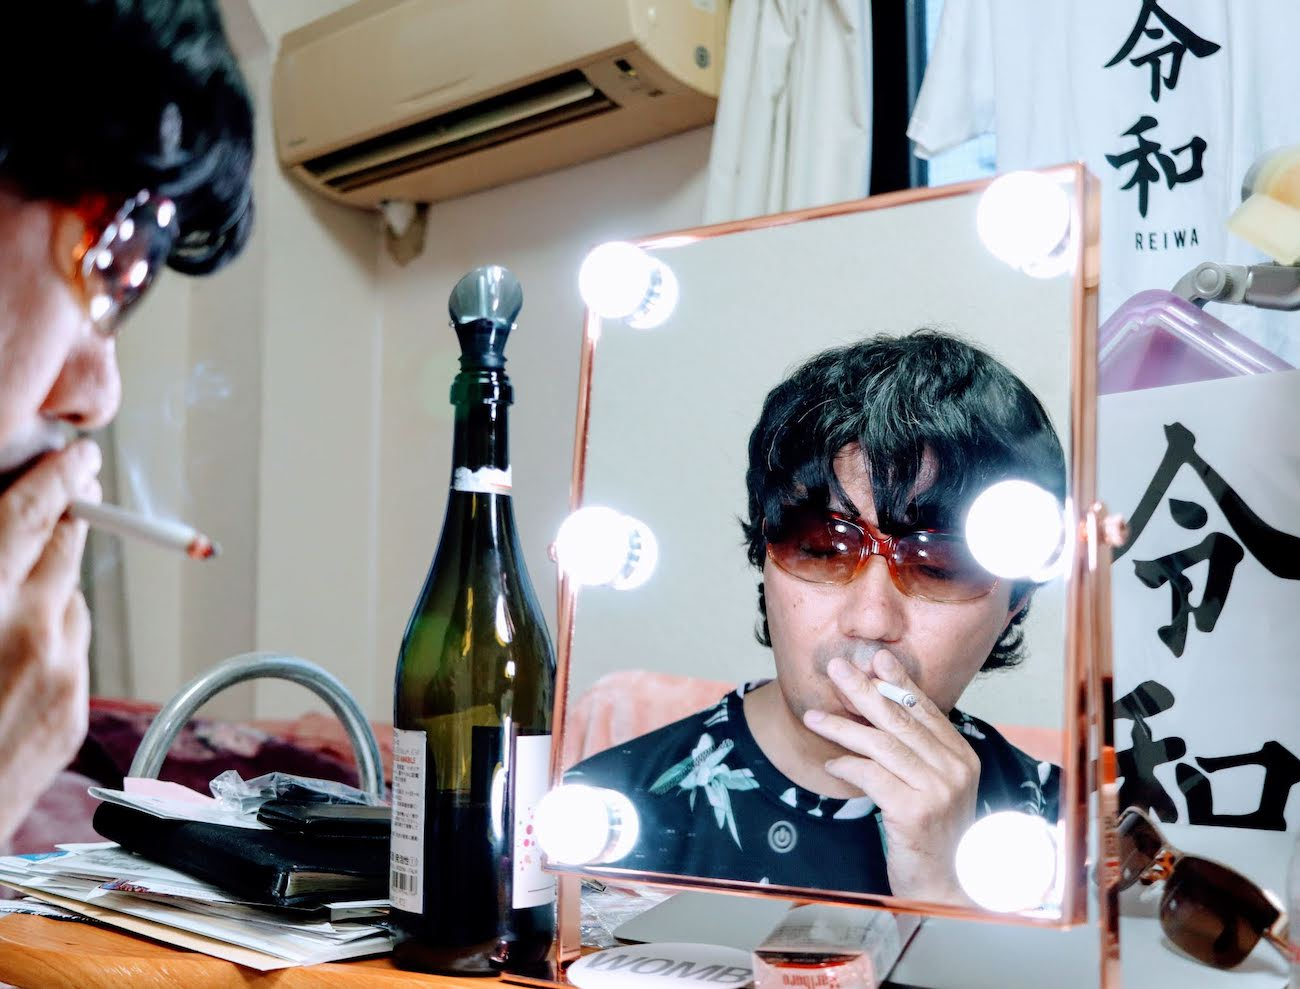 SHUN ONLINE(樺澤俊悟)/令和時代への準備(2019年4月29日、渋谷にて)